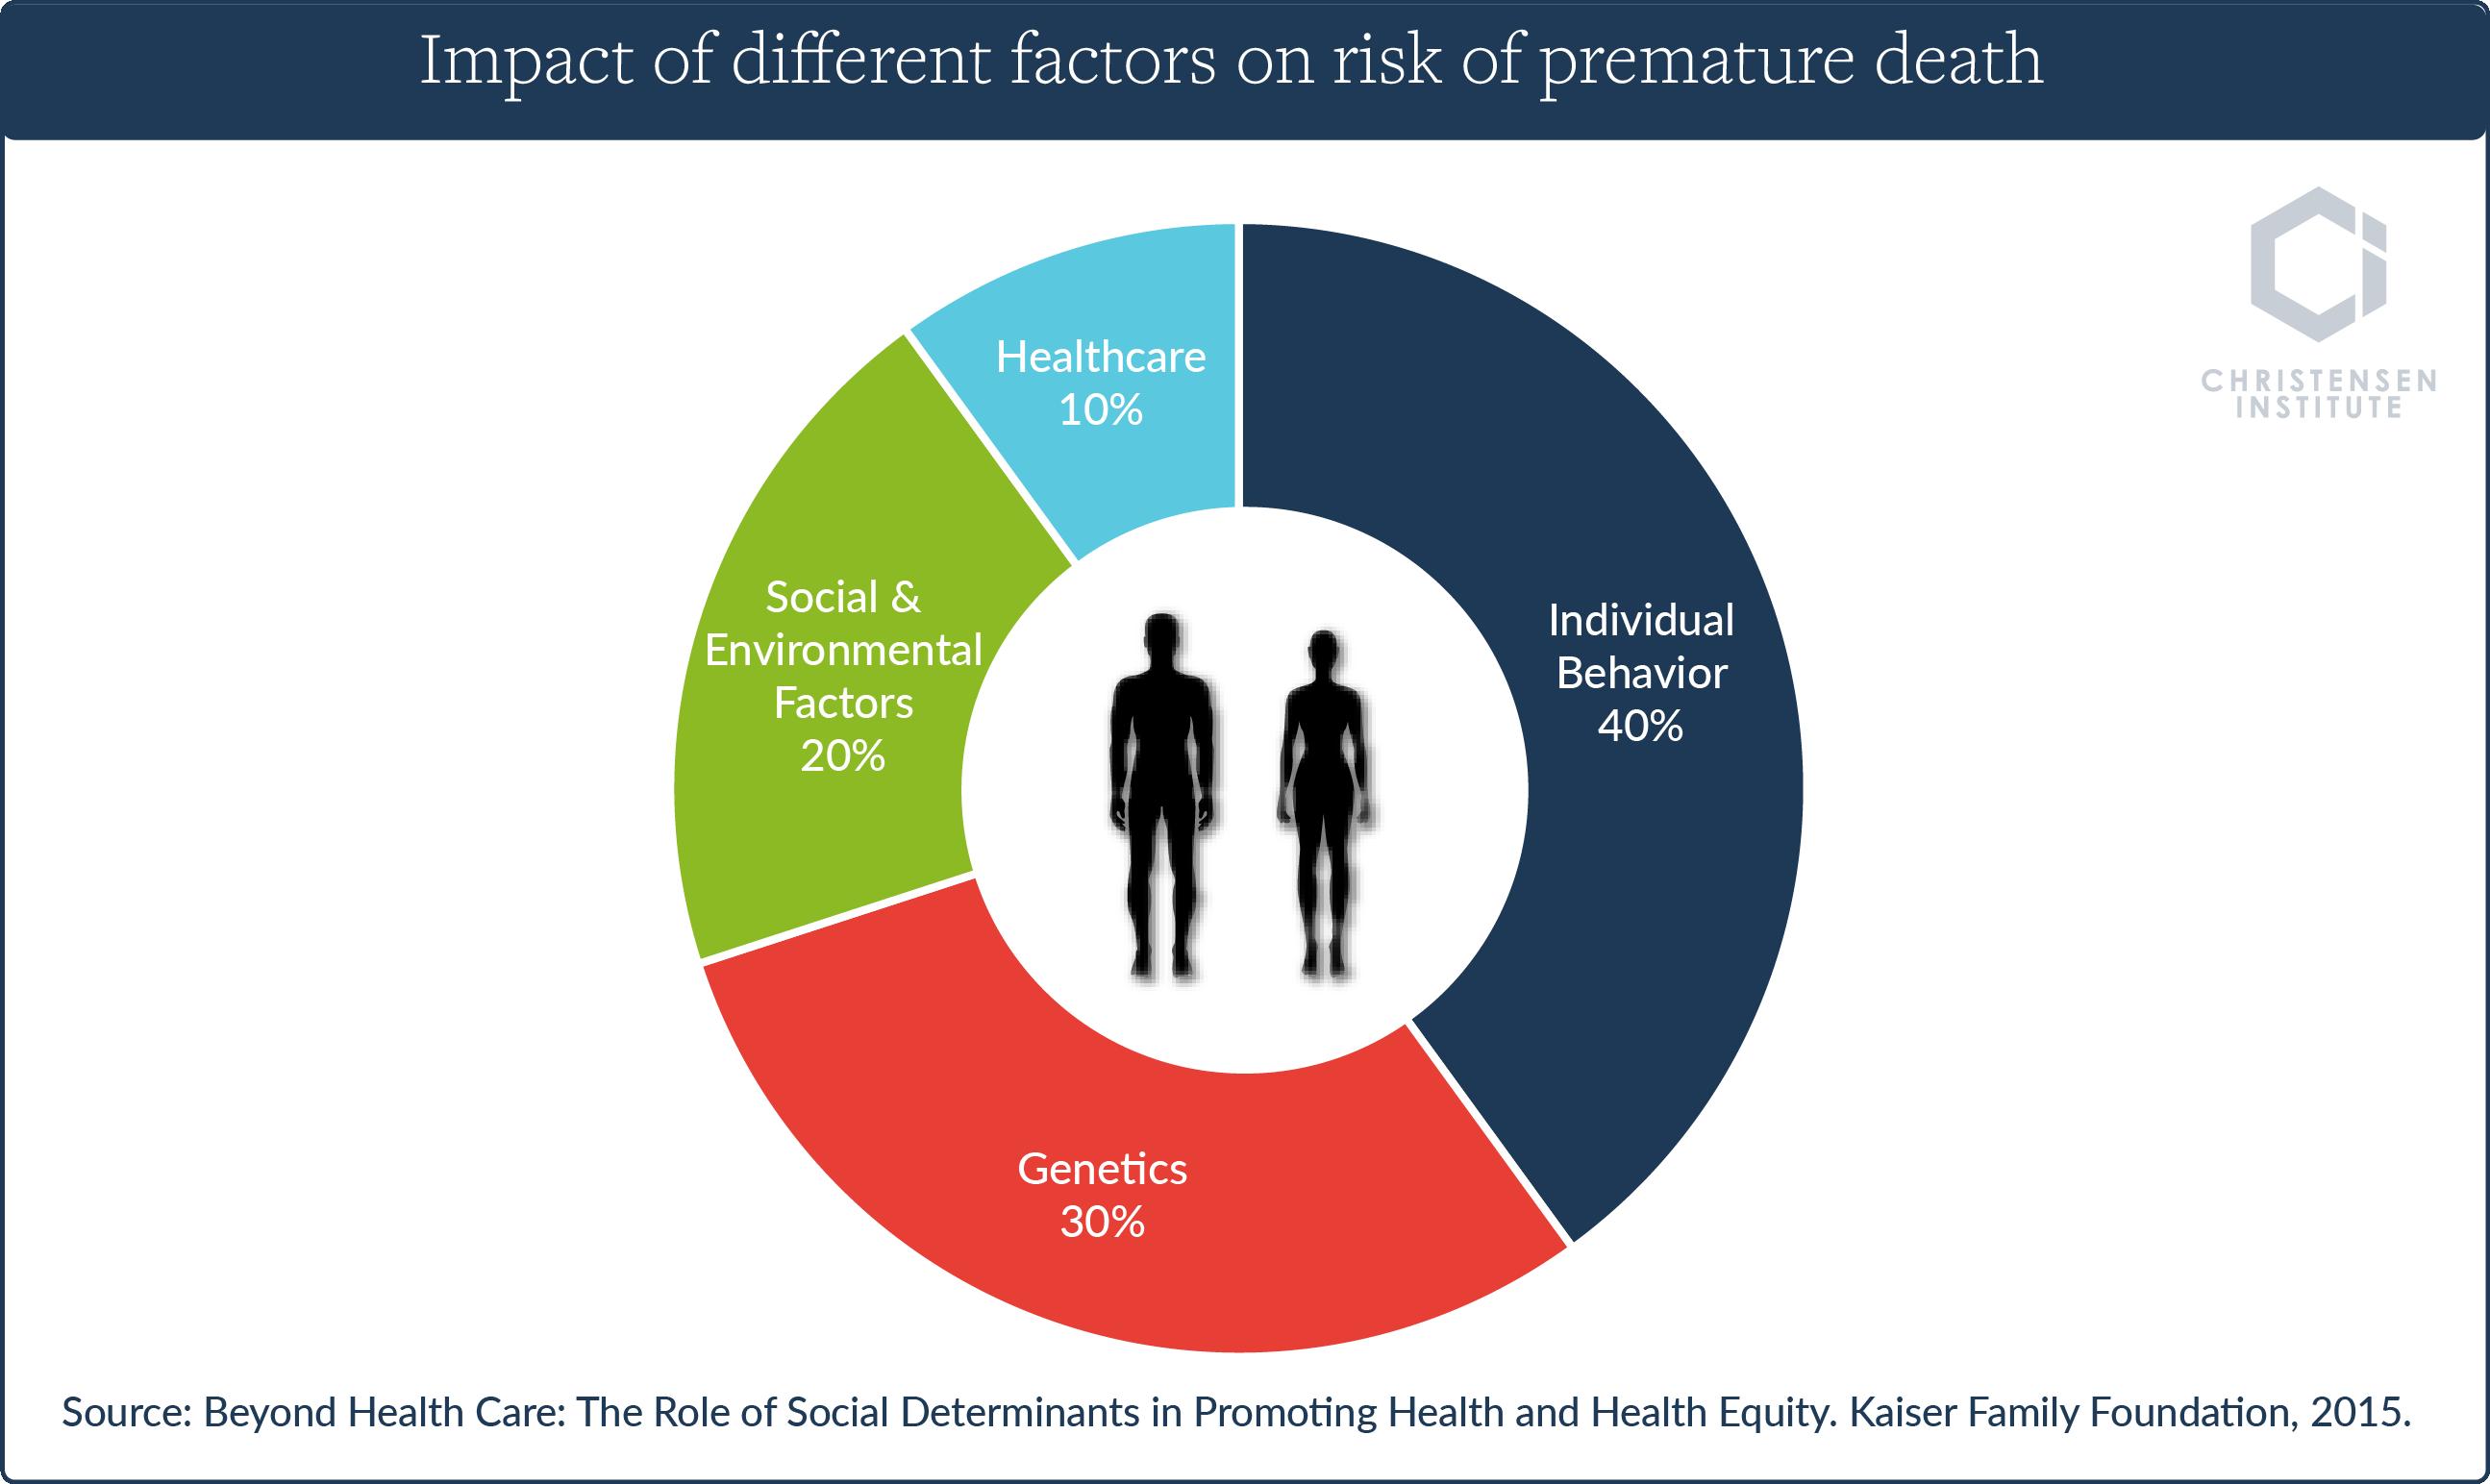 Healthcare pie chart Becca social - Christensen Institute